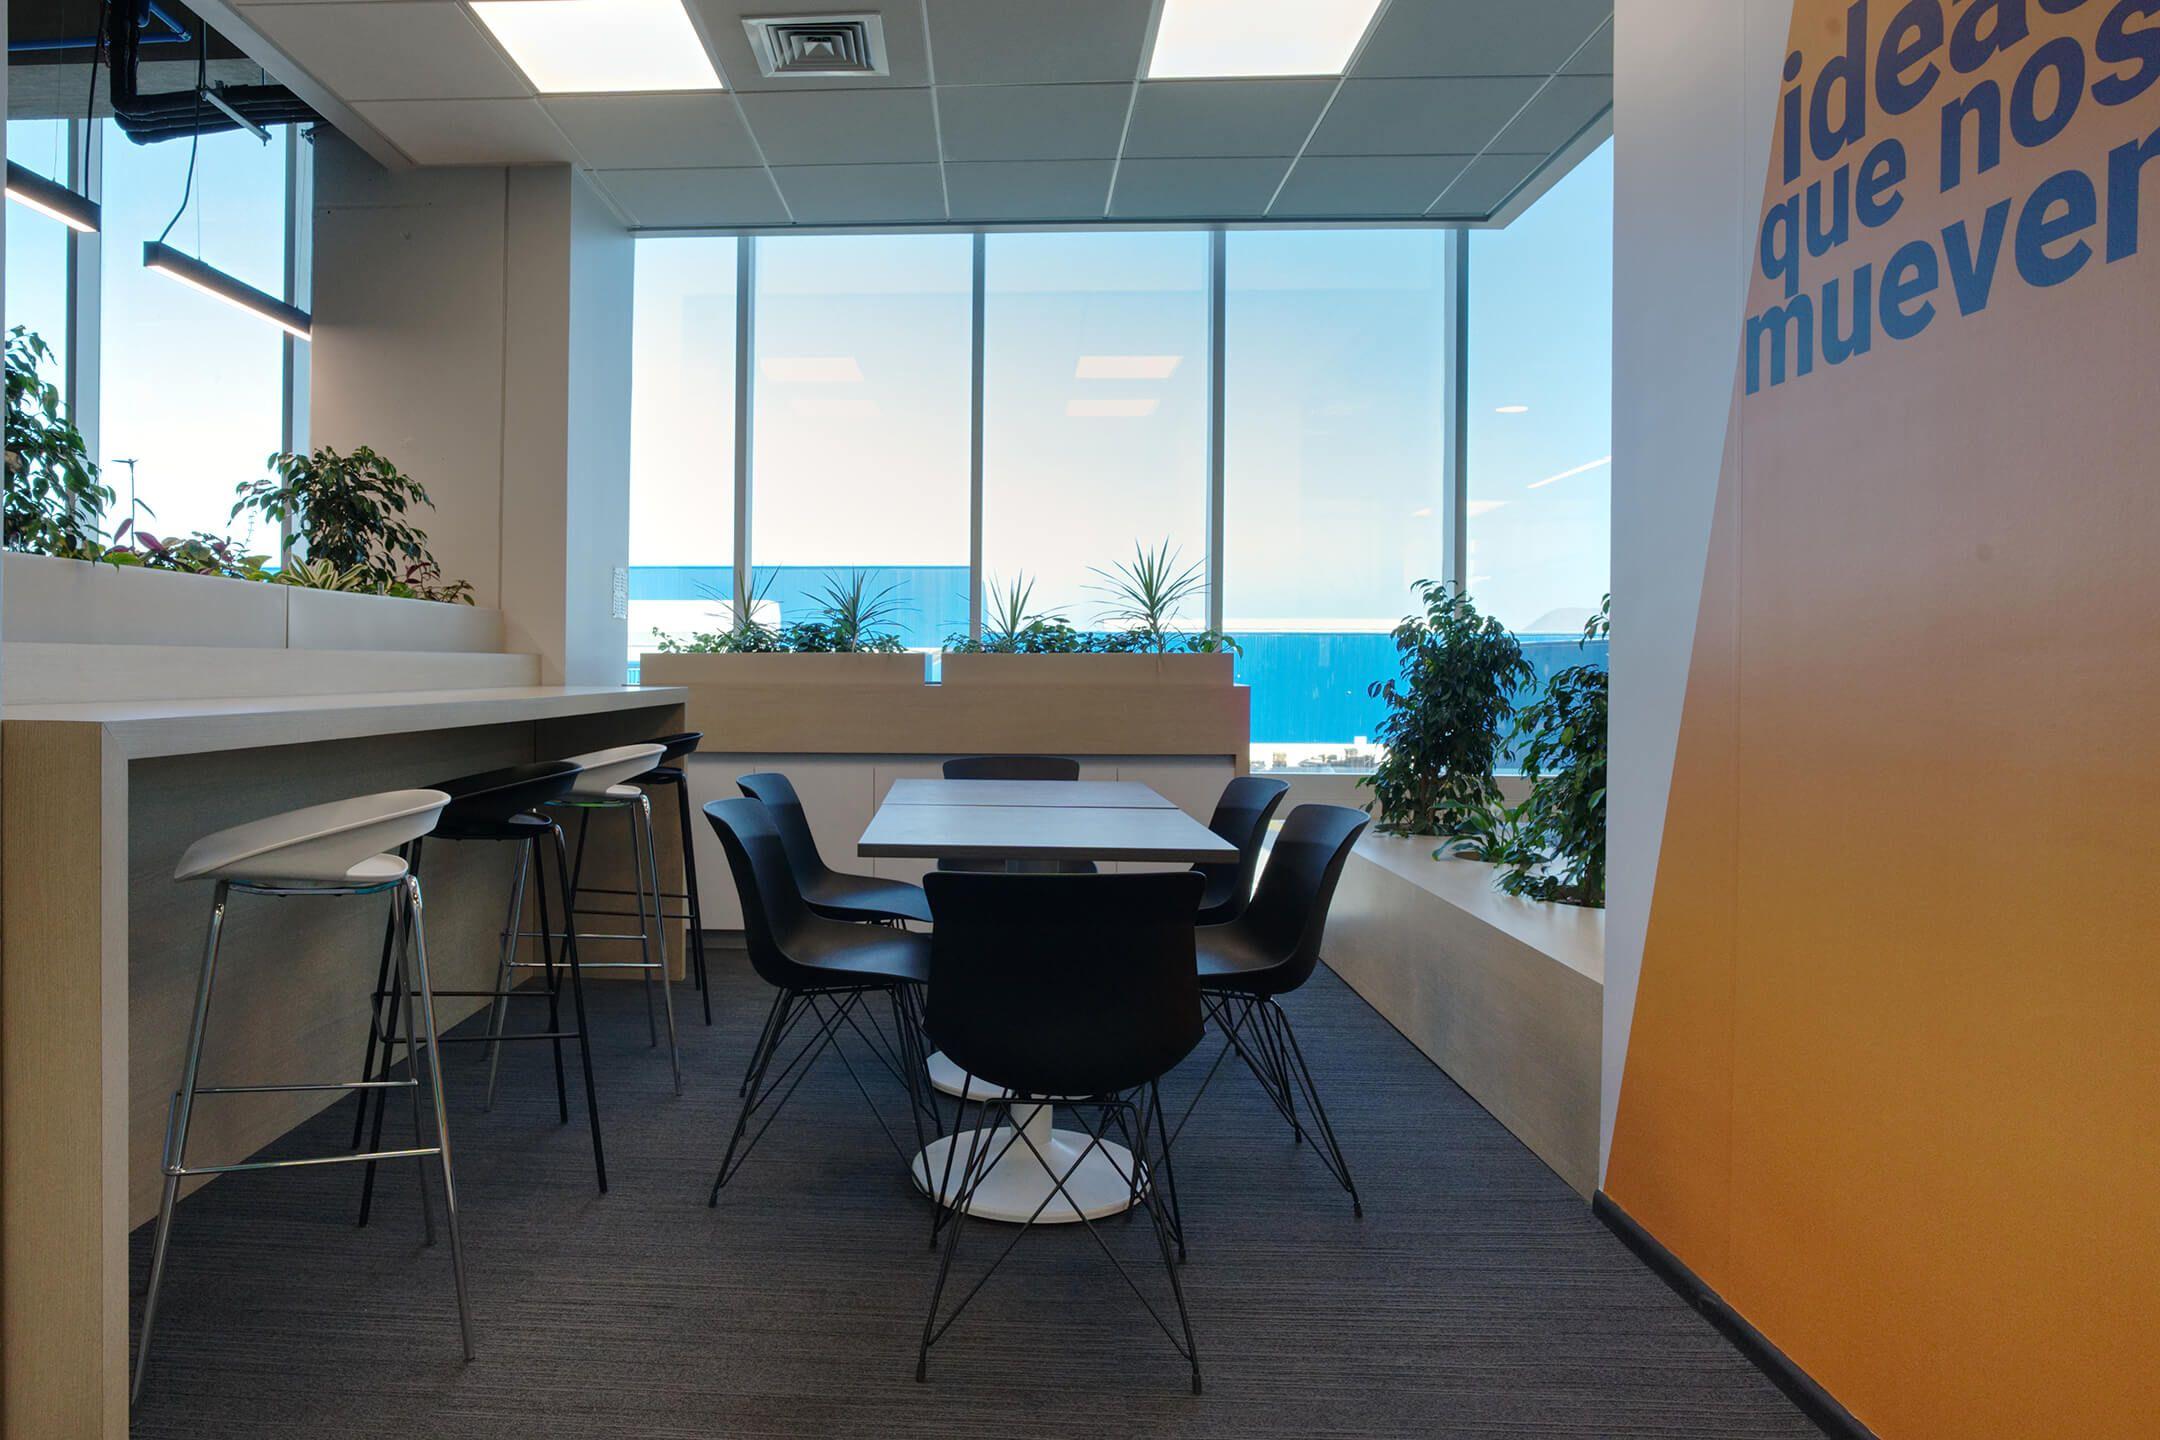 mesa coffee break sillas de diseño